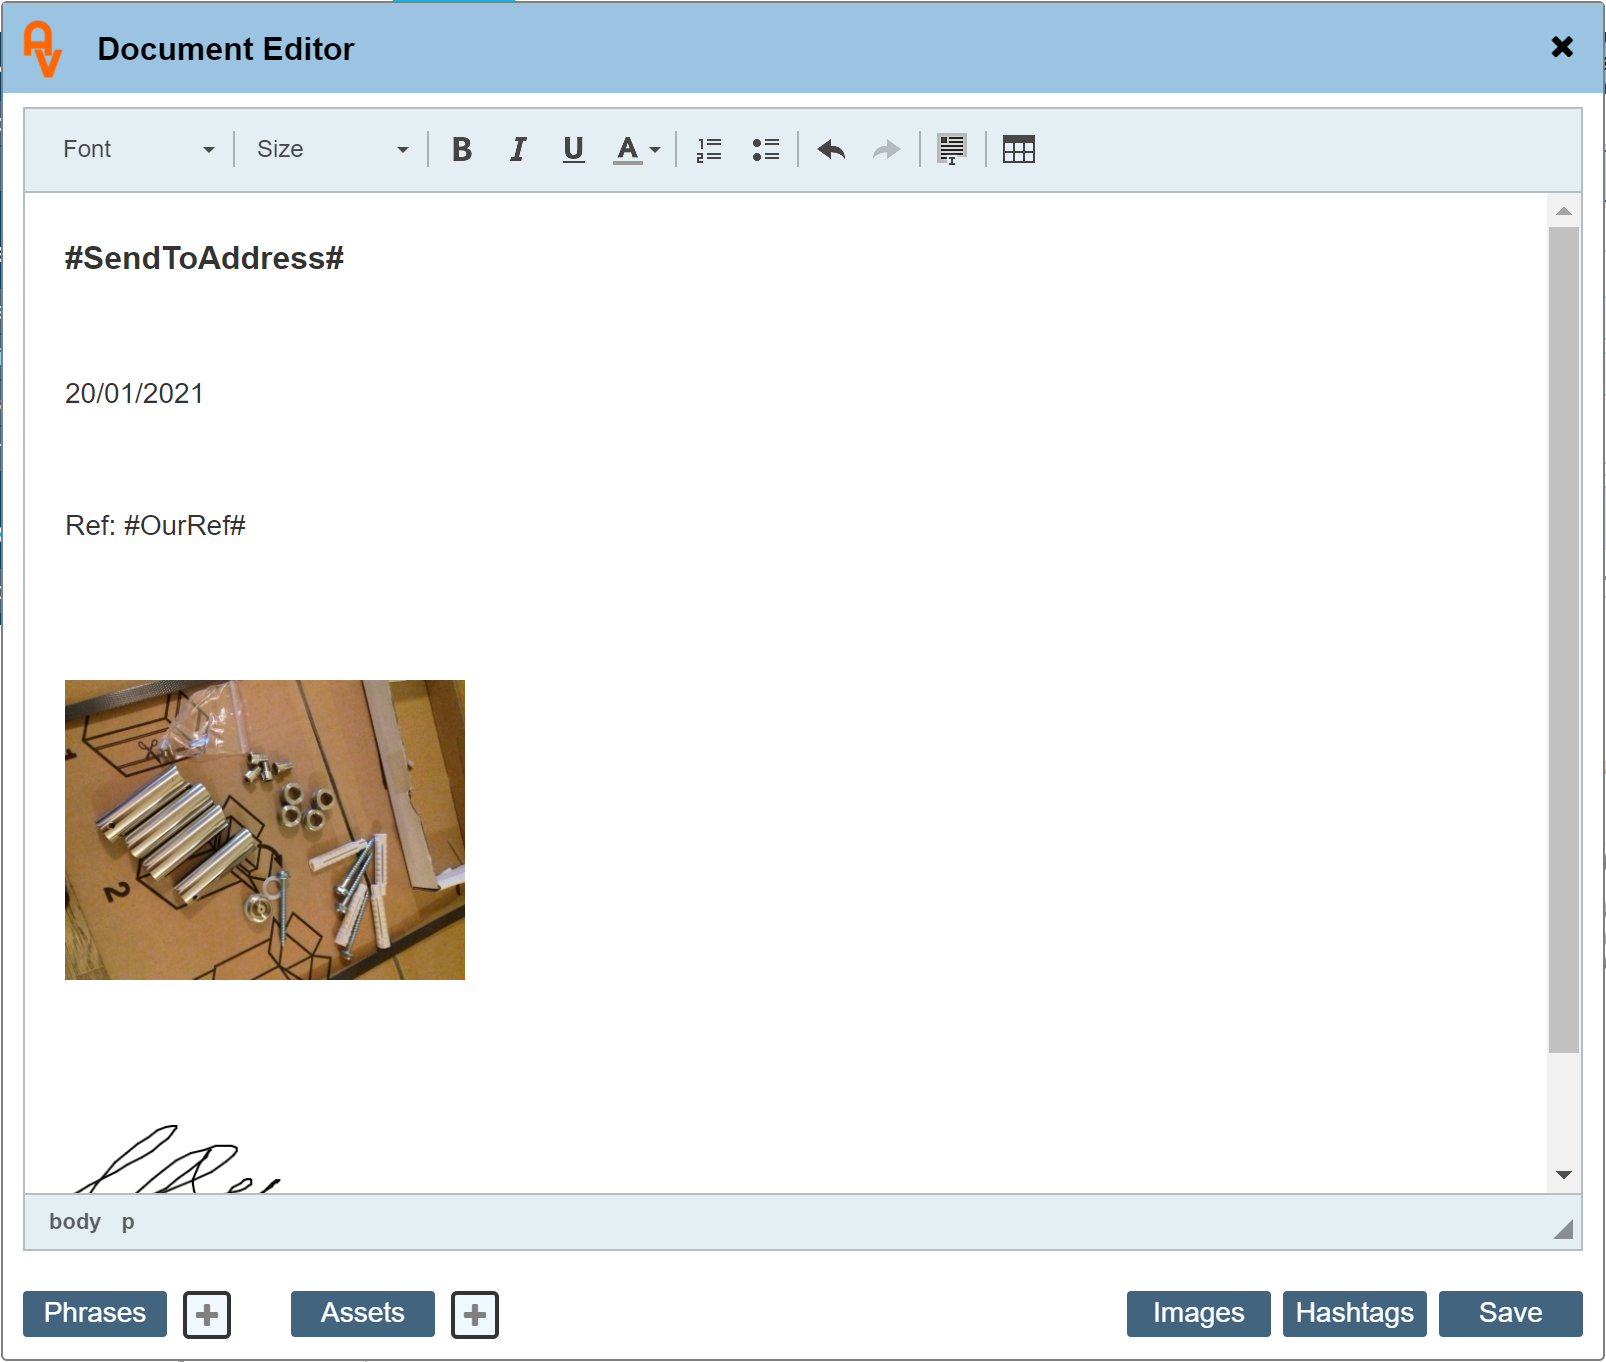 Text Editor Image